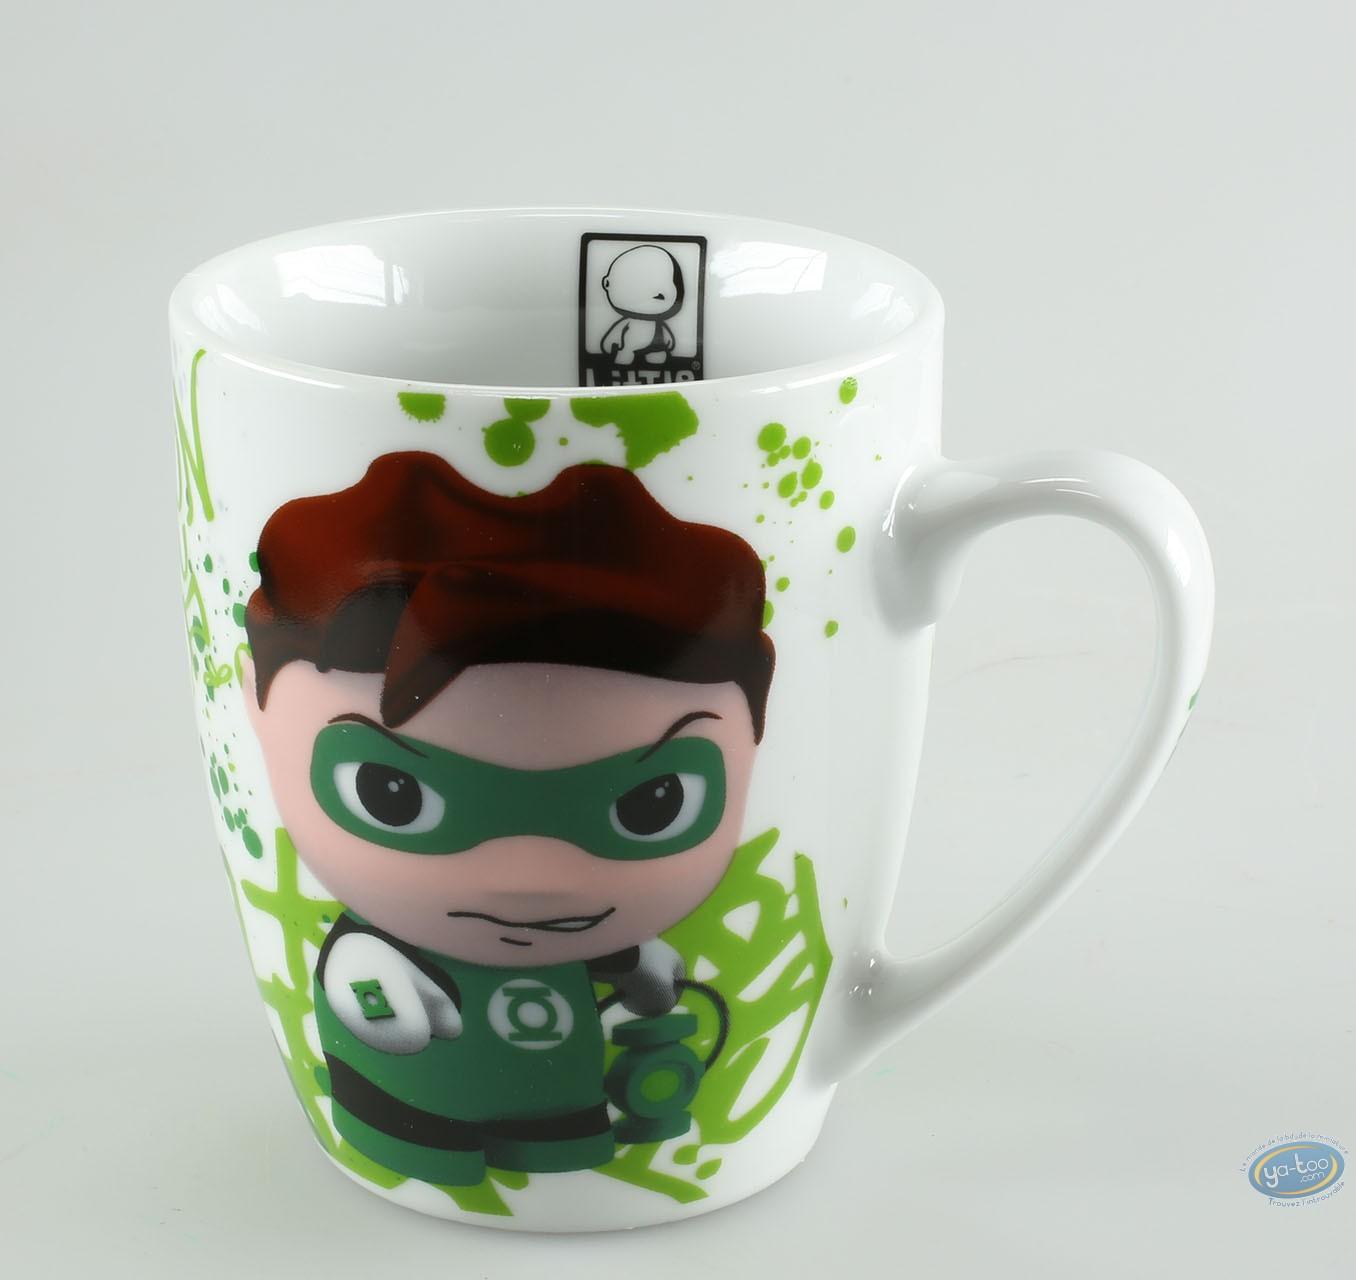 Tableware, Marvel Super Héros : Set of 5 decorated mugs